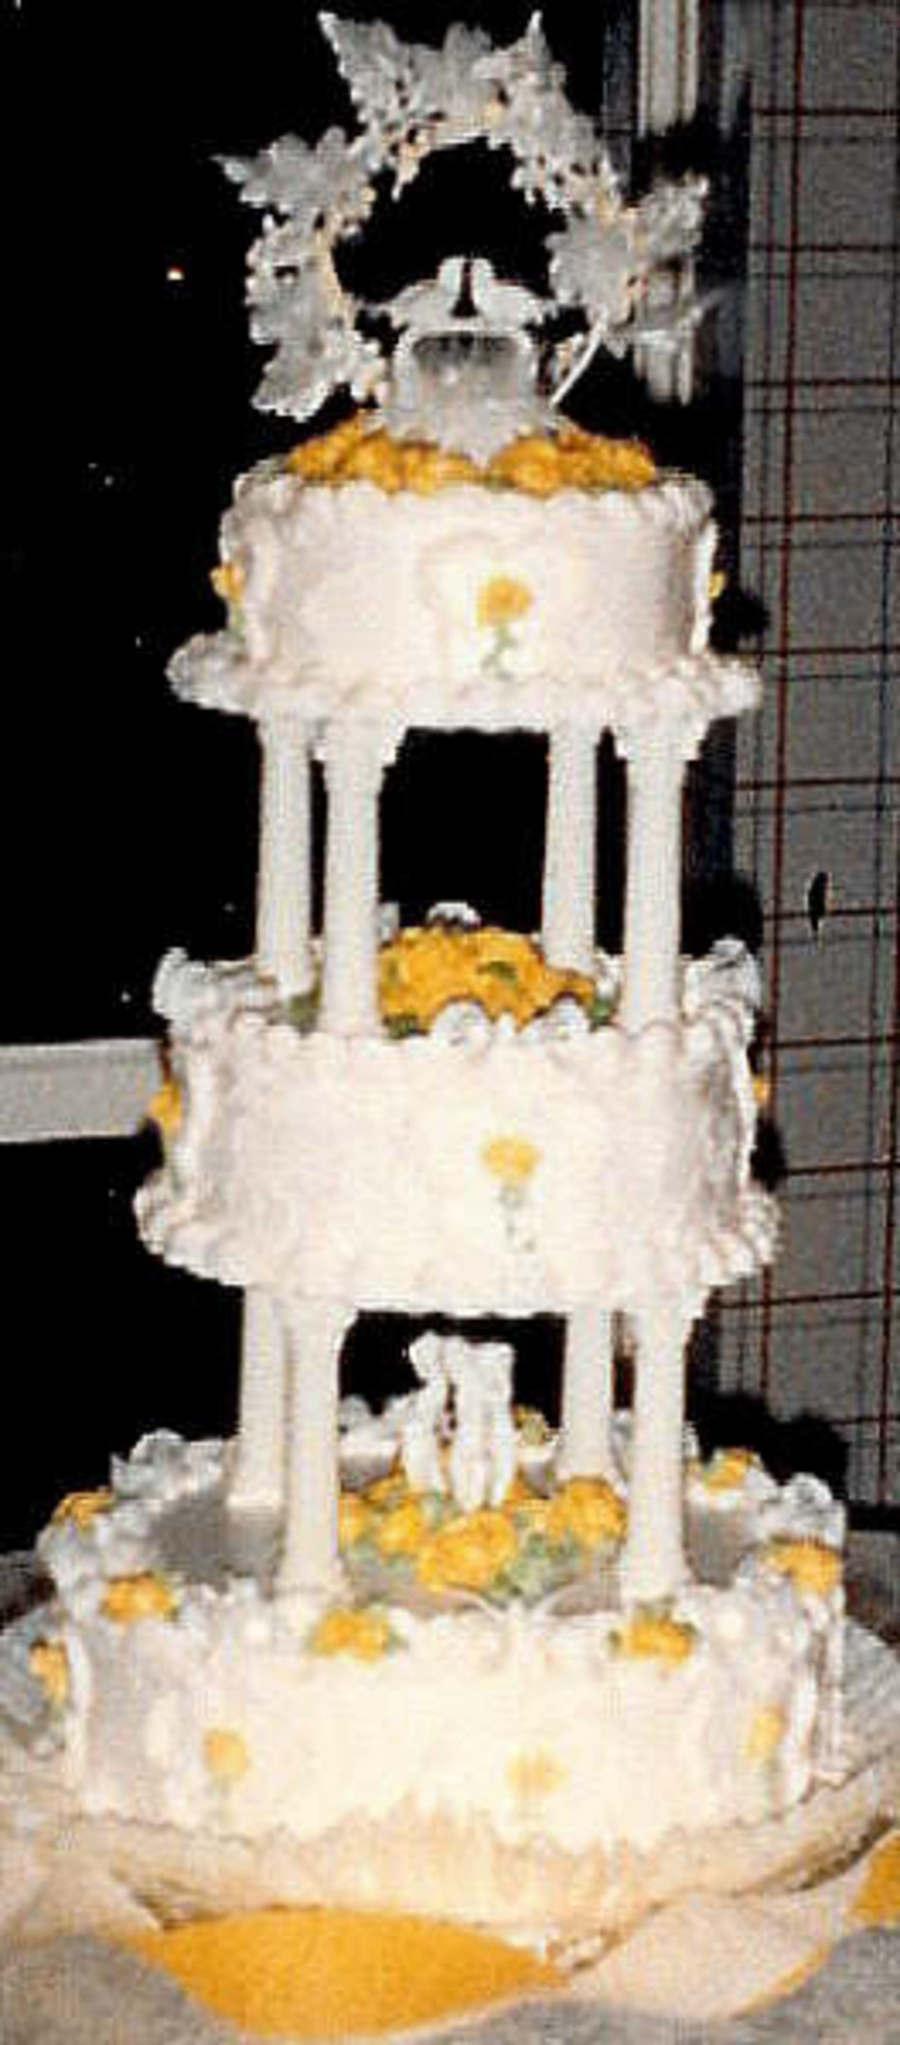 3 Tier Pillar Stacked Chocolate Cake With Handmade